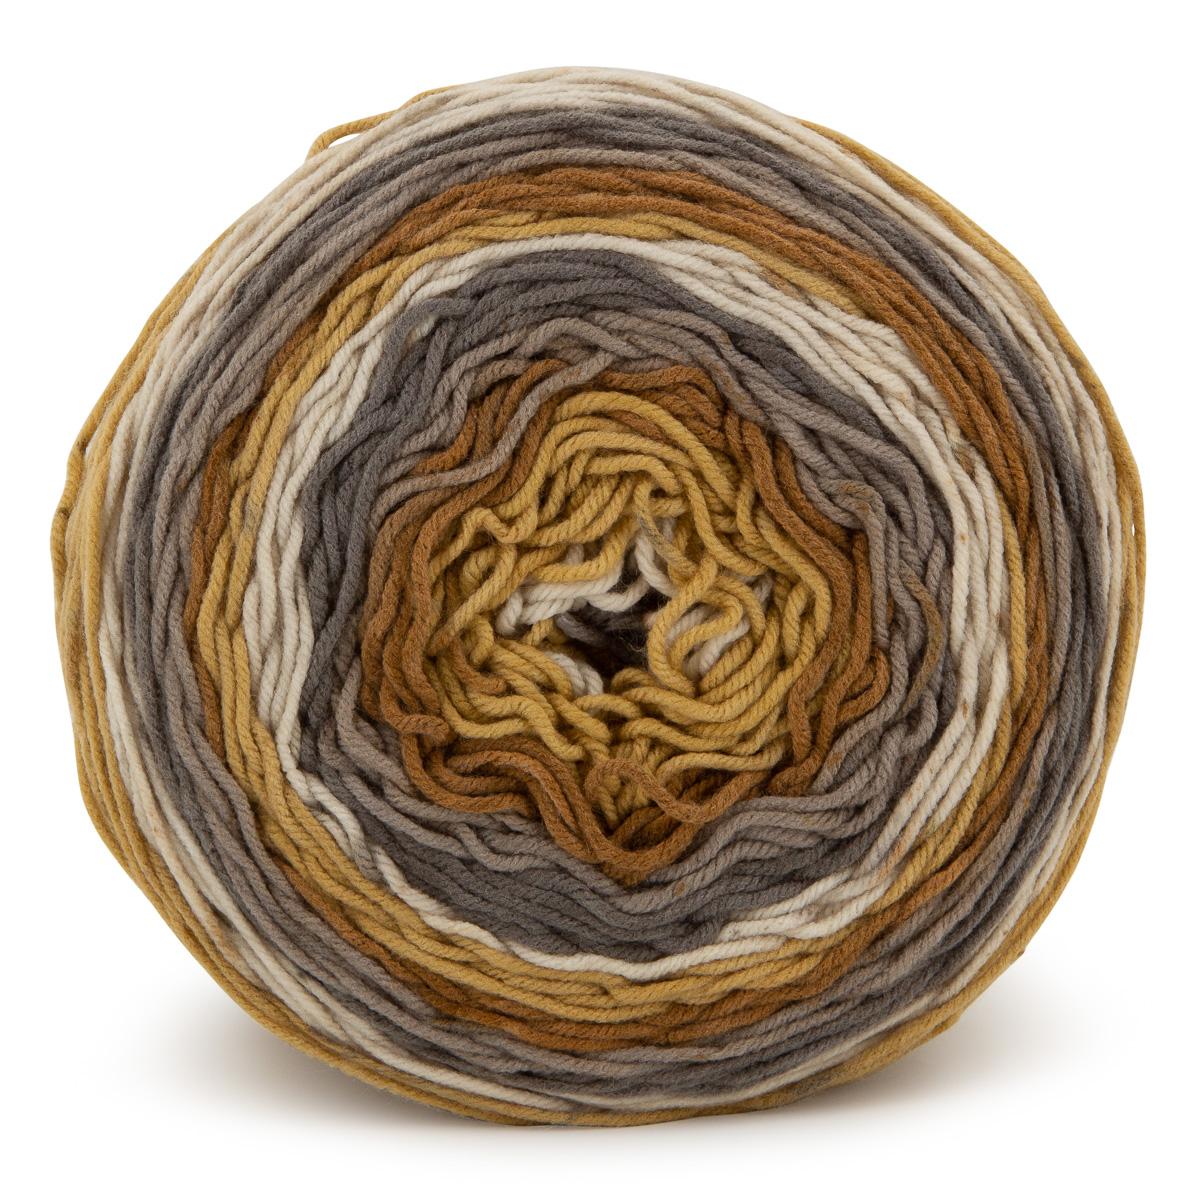 Caron-Big-Cakes-100-Acrylic-Worsted-Striping-Yarn-Medium-4-Cake-Knit-Crochet thumbnail 18